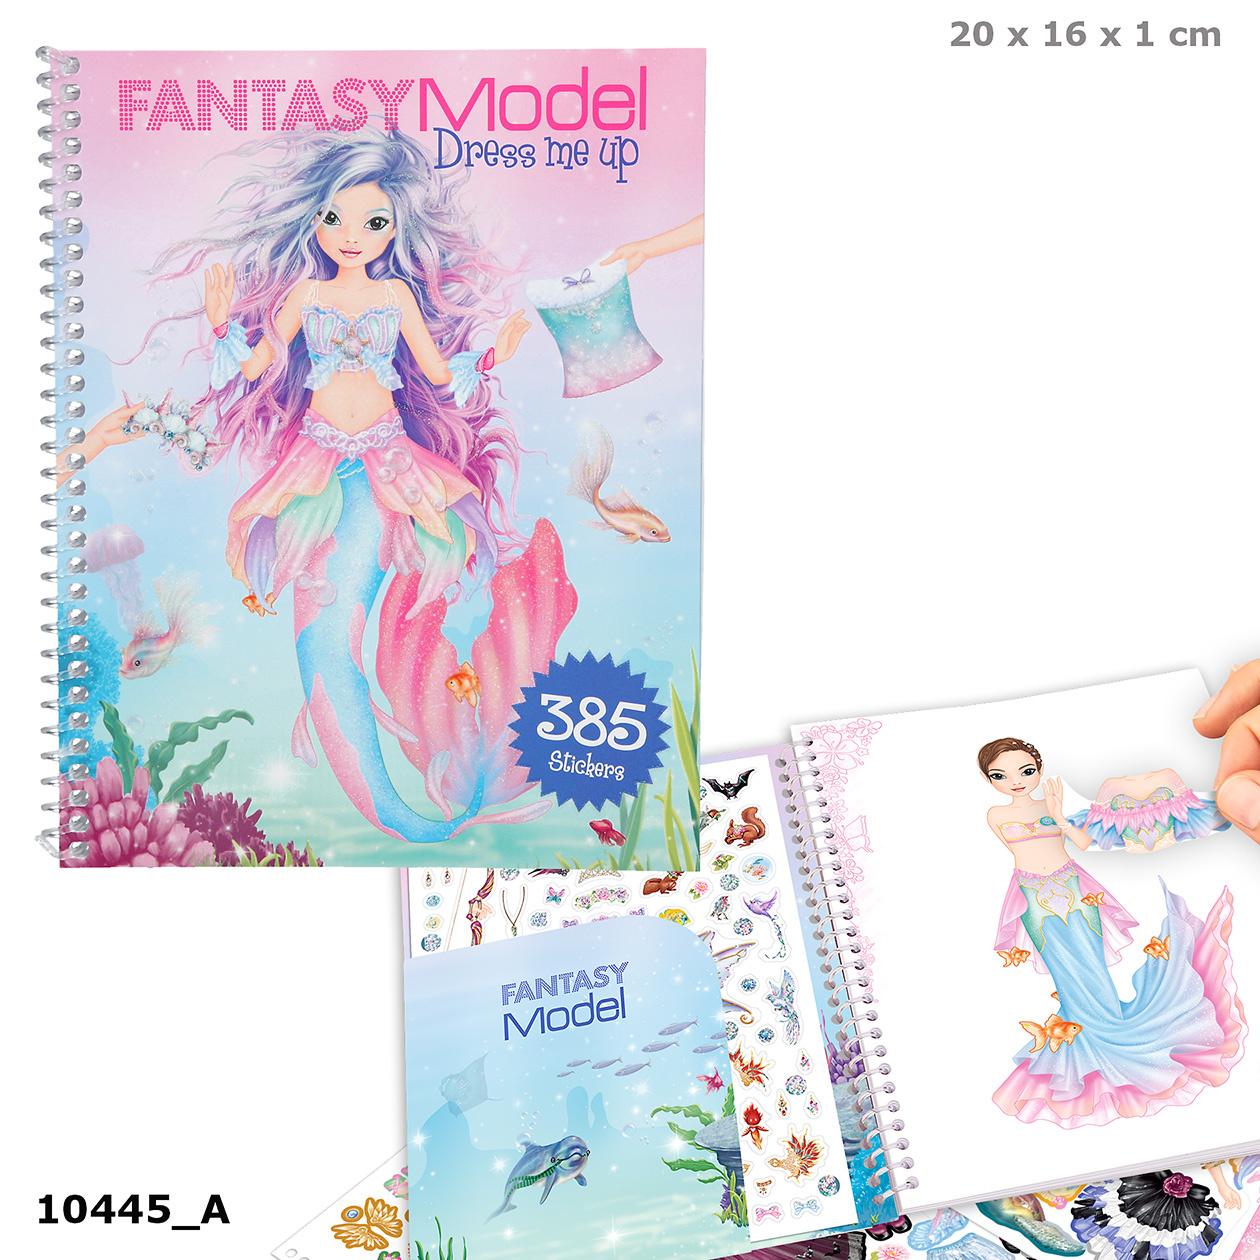 Top Model Fantasy Model - Dress Me Up Sticker Book